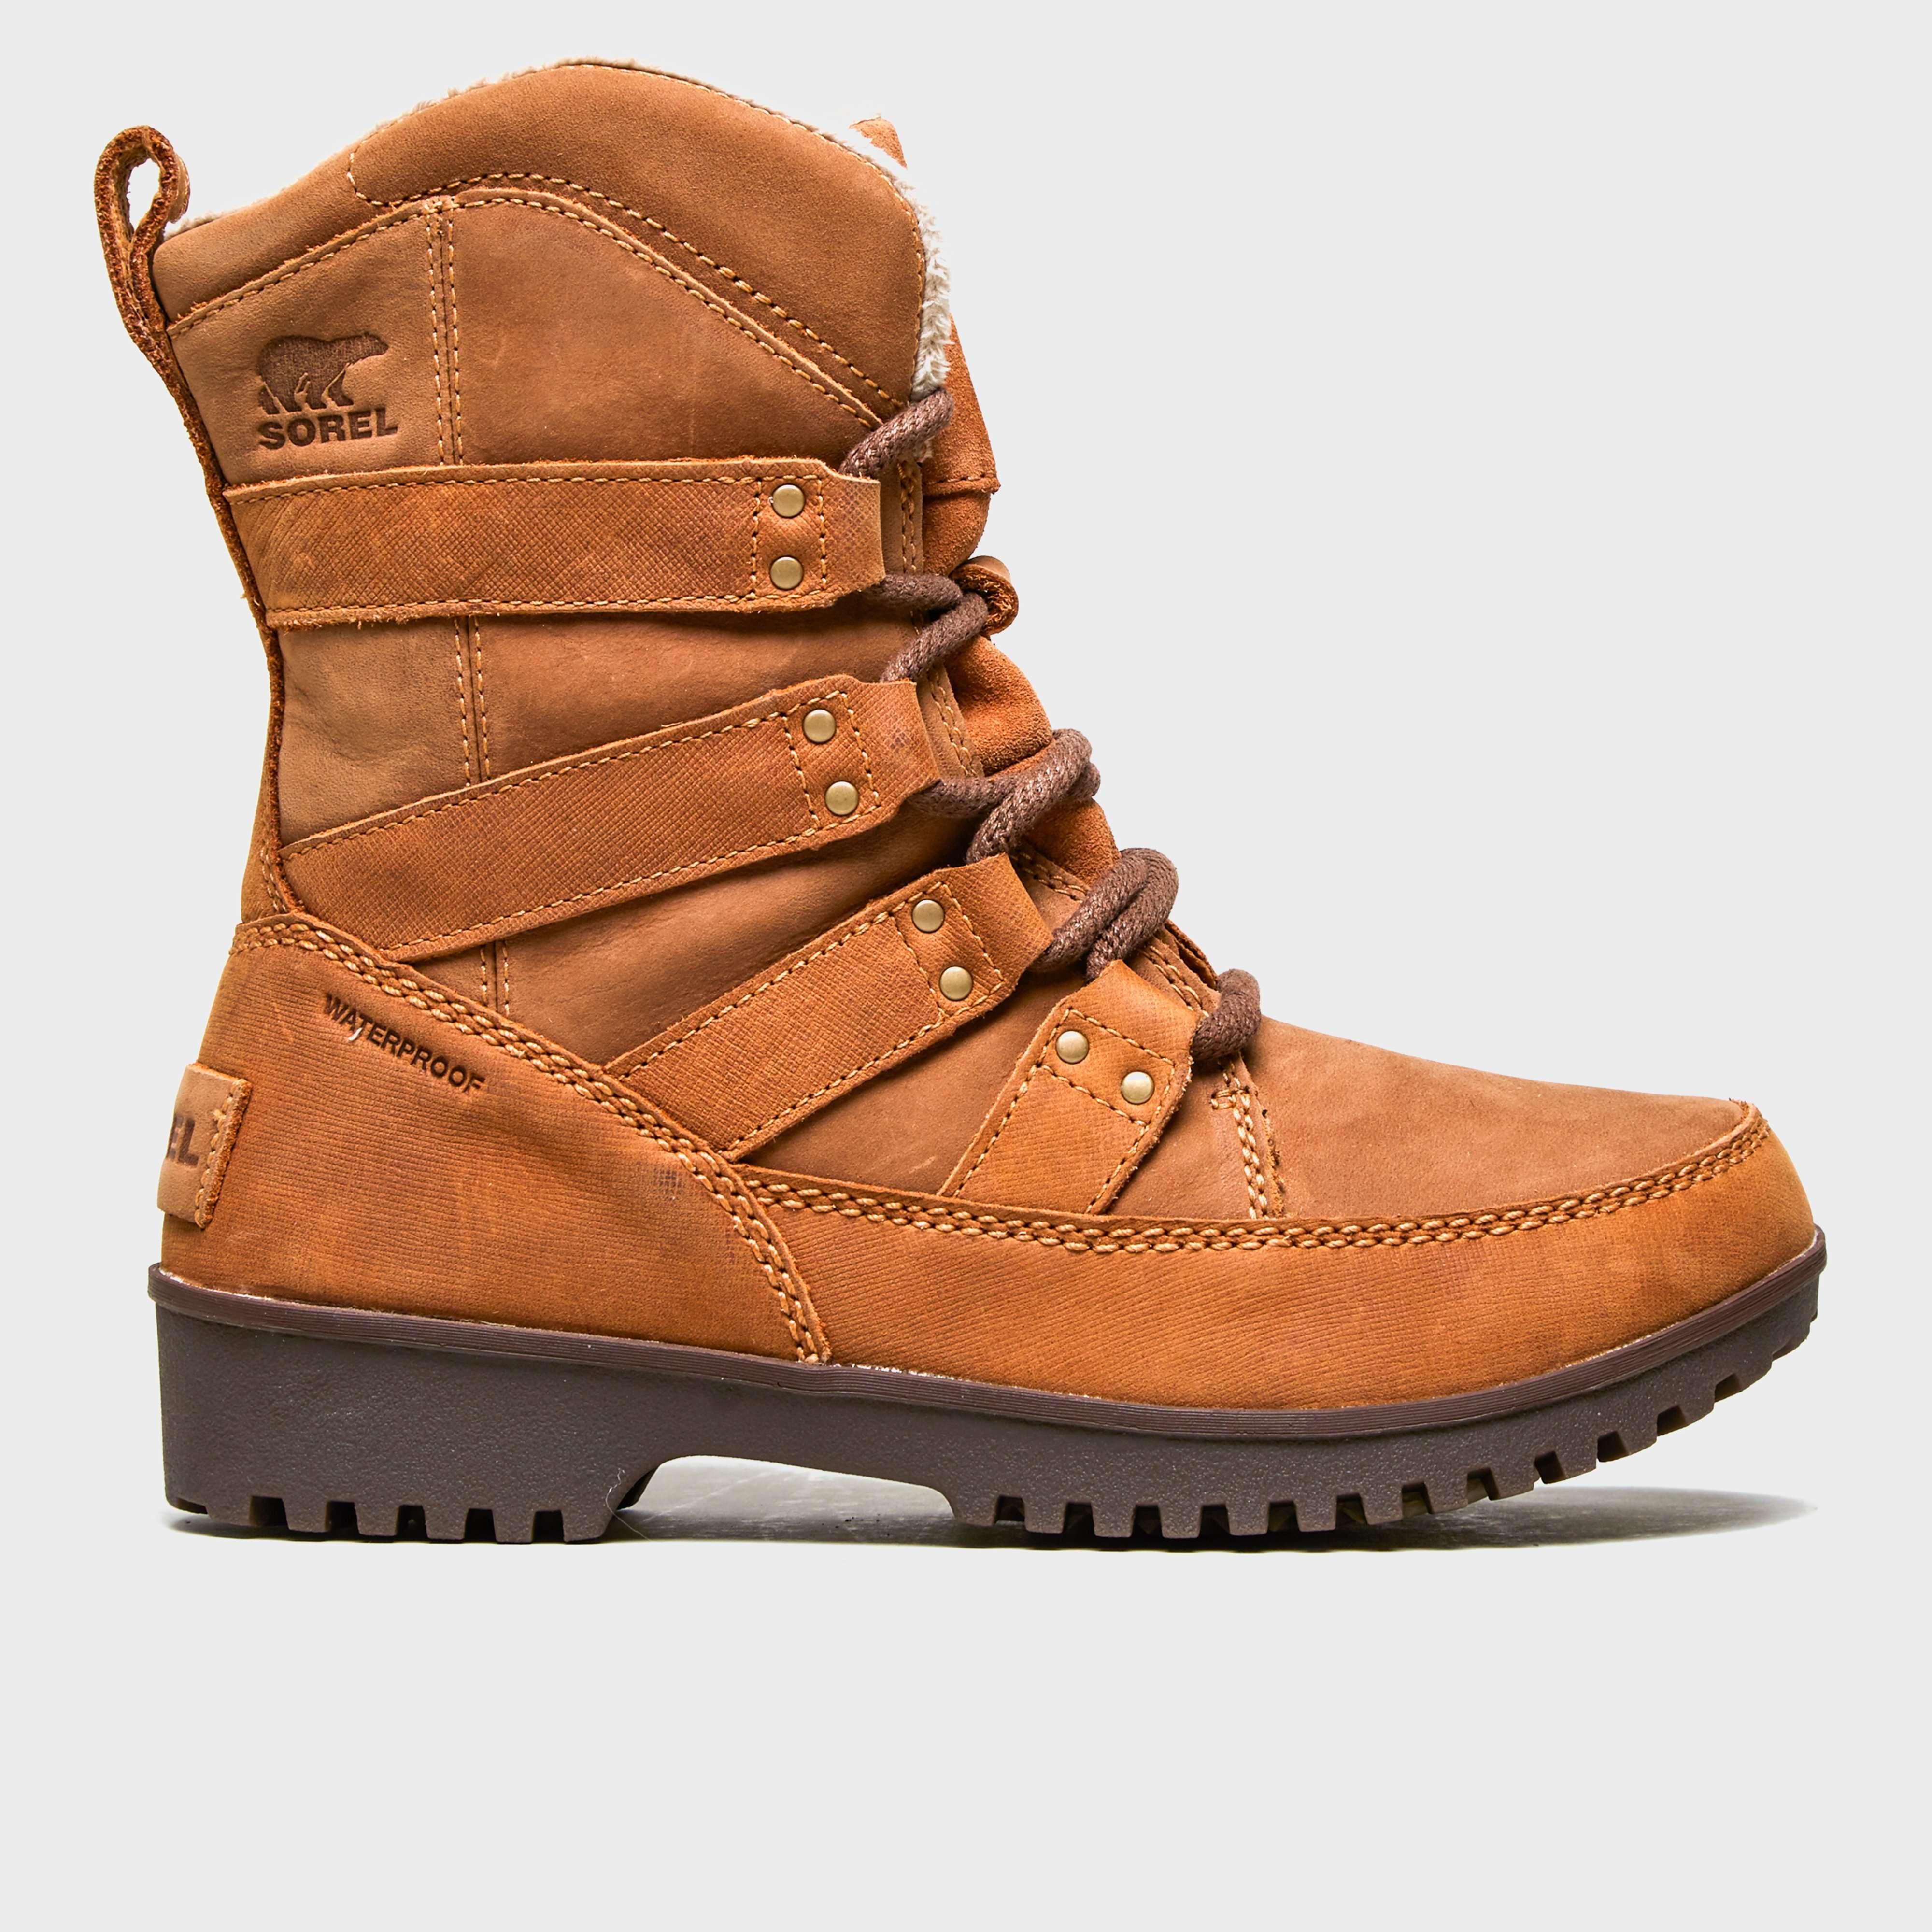 SOREL Women's Meadow Premium Snow Boot